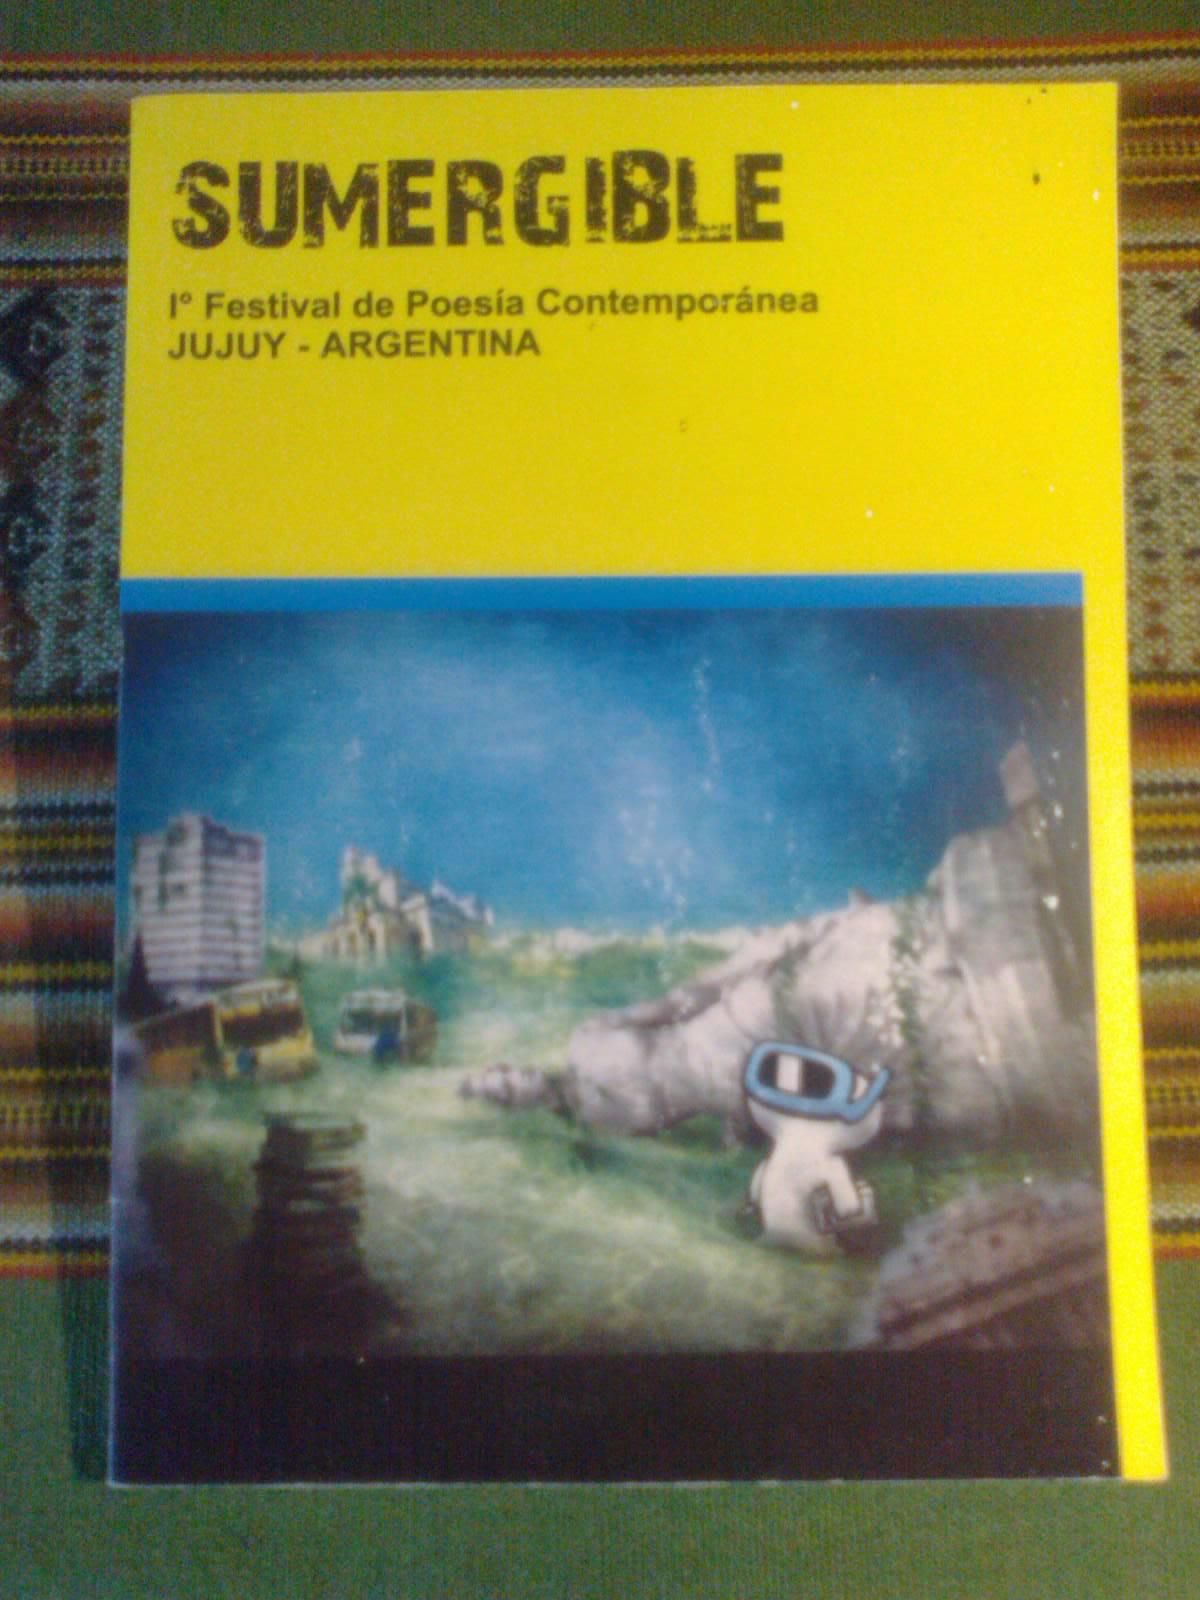 """Sumergible"", 1er. Festival de Poesía Contemporánea, Ediunju, 2012."